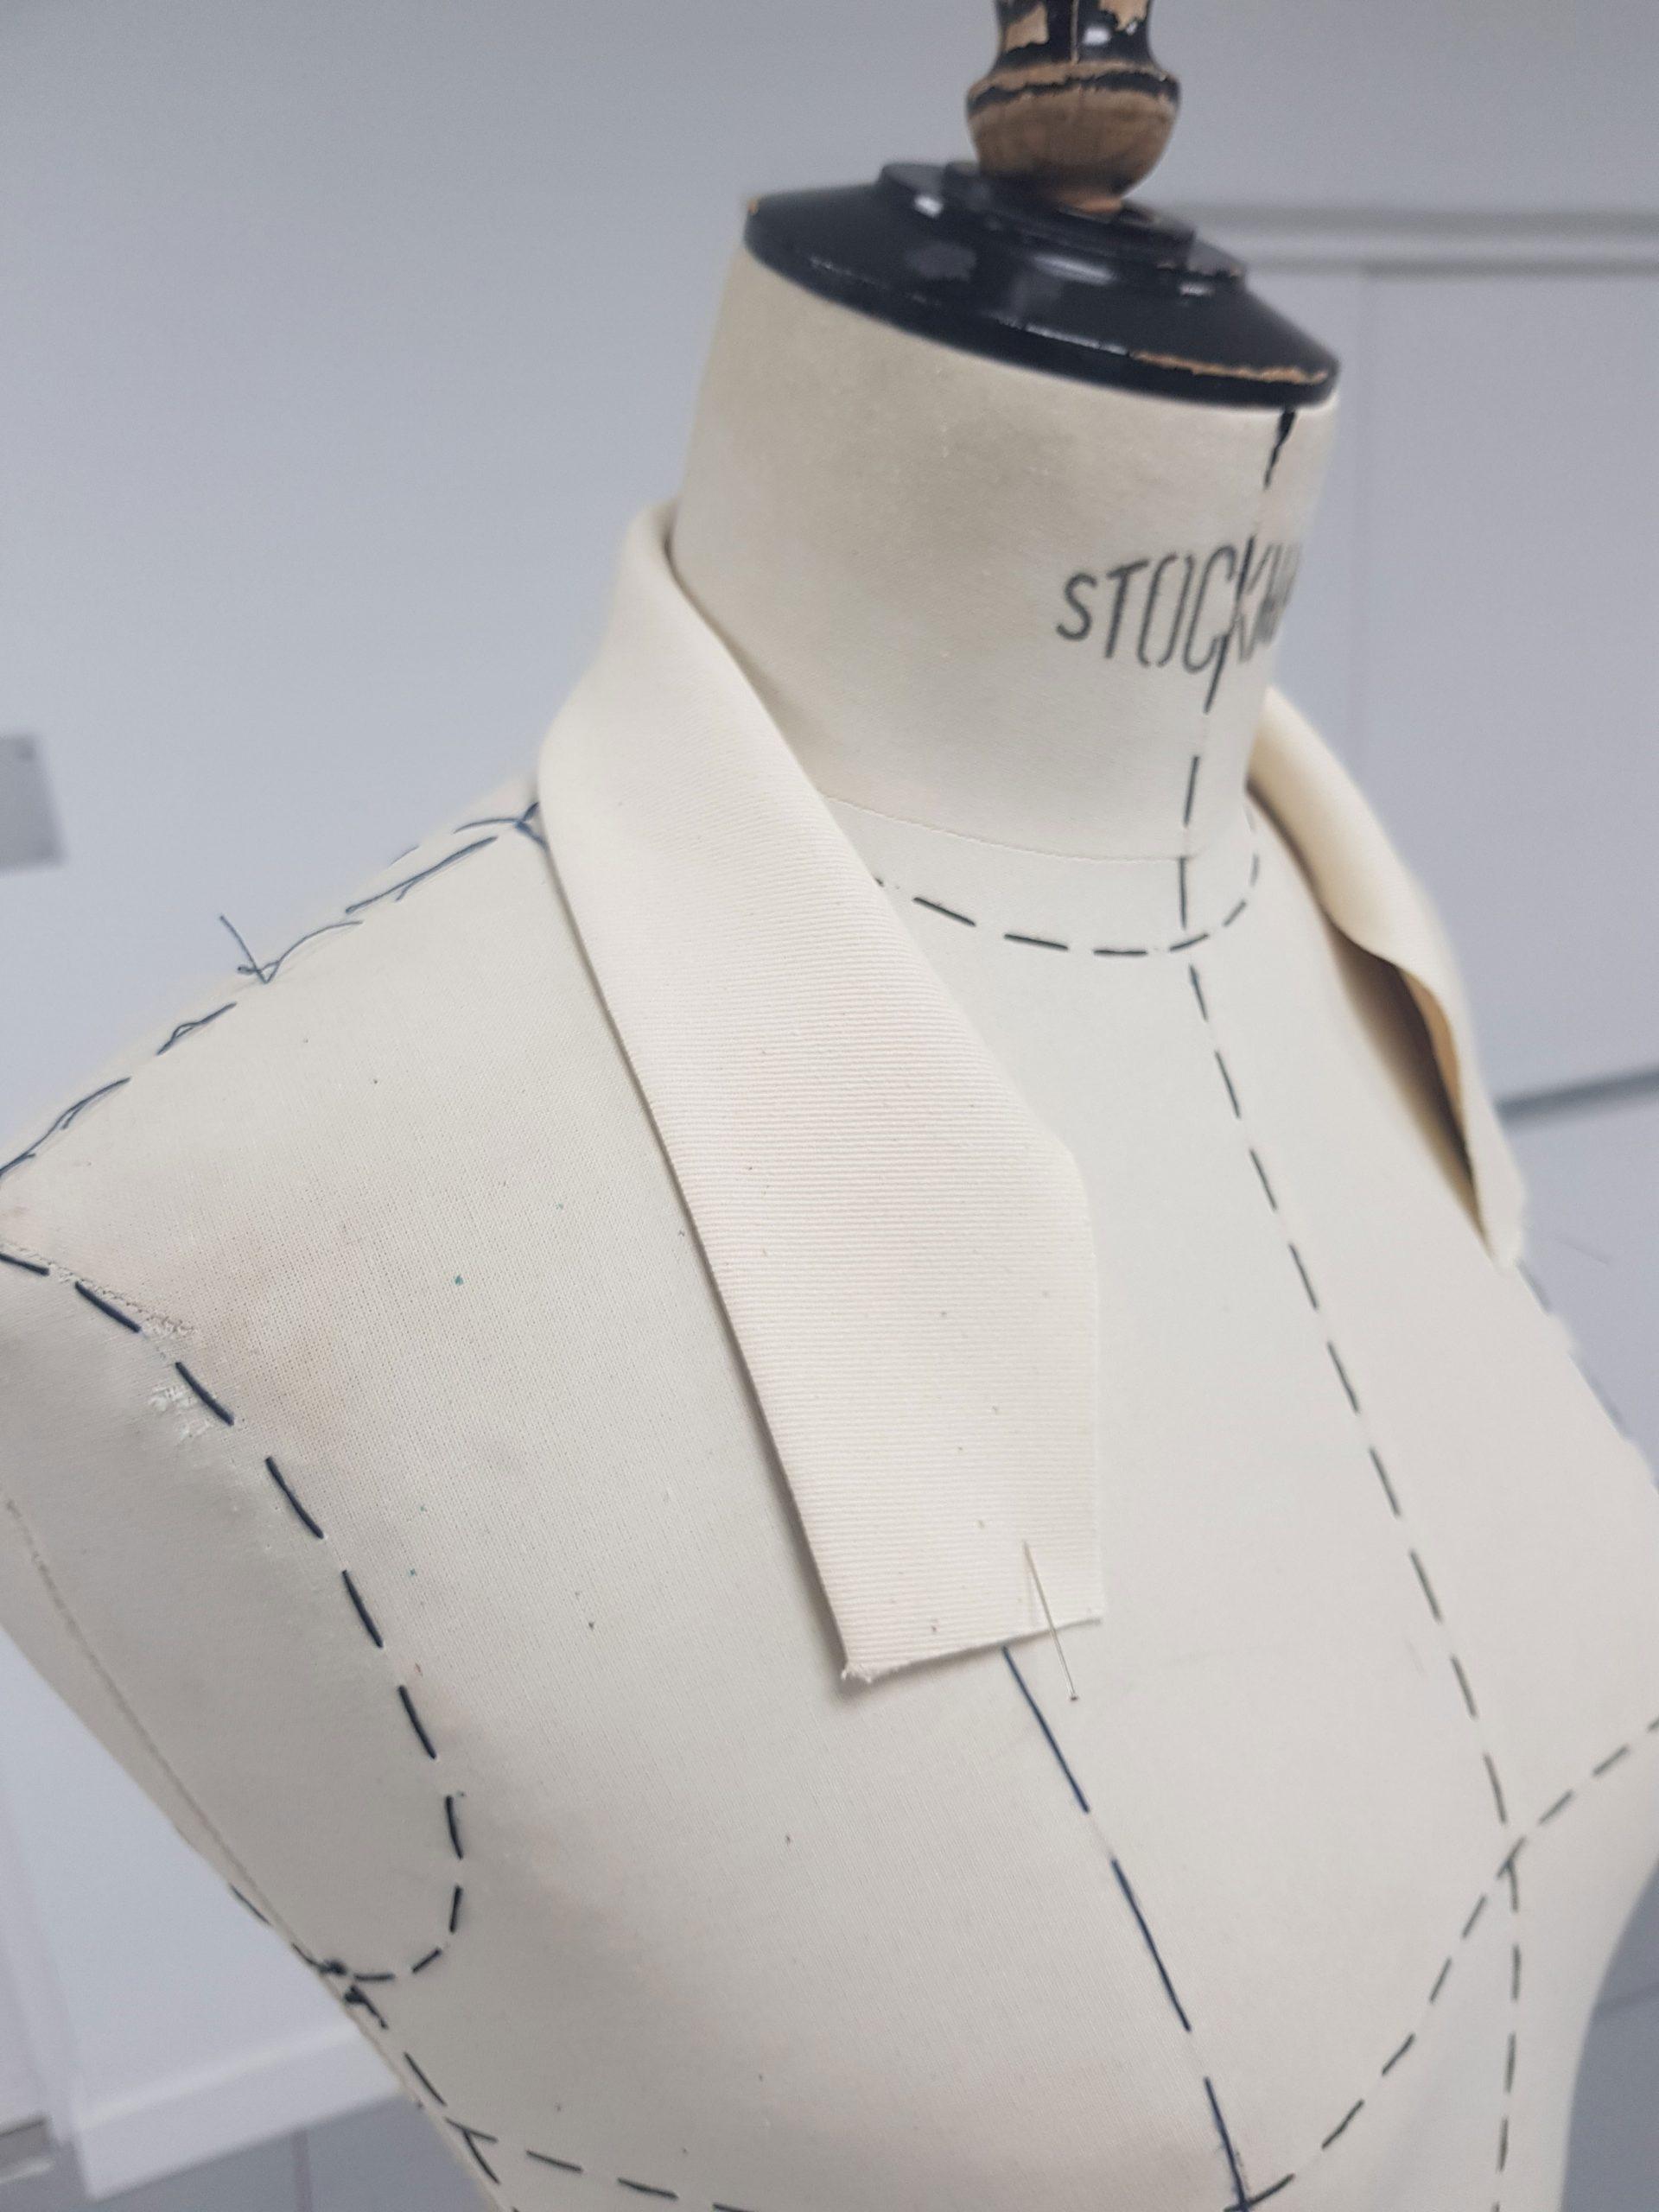 CBM - Pieza 2021 - Study Collection